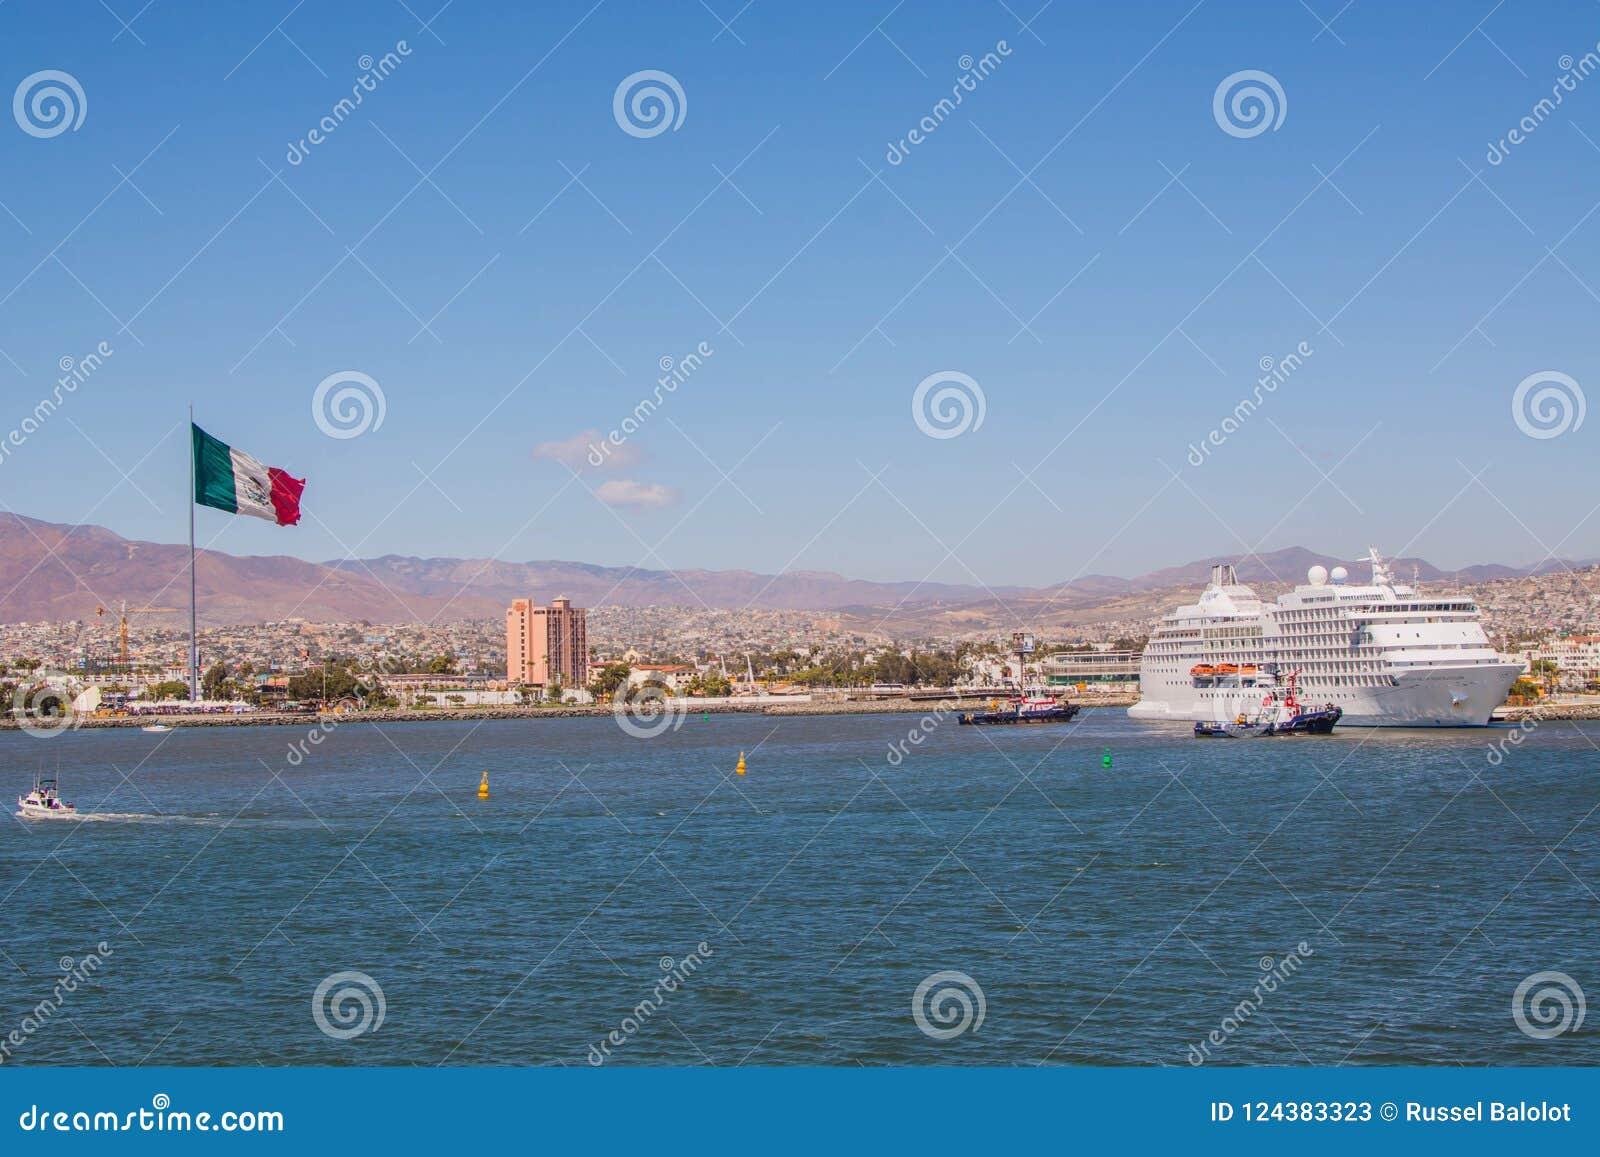 Ensanada, Mexico